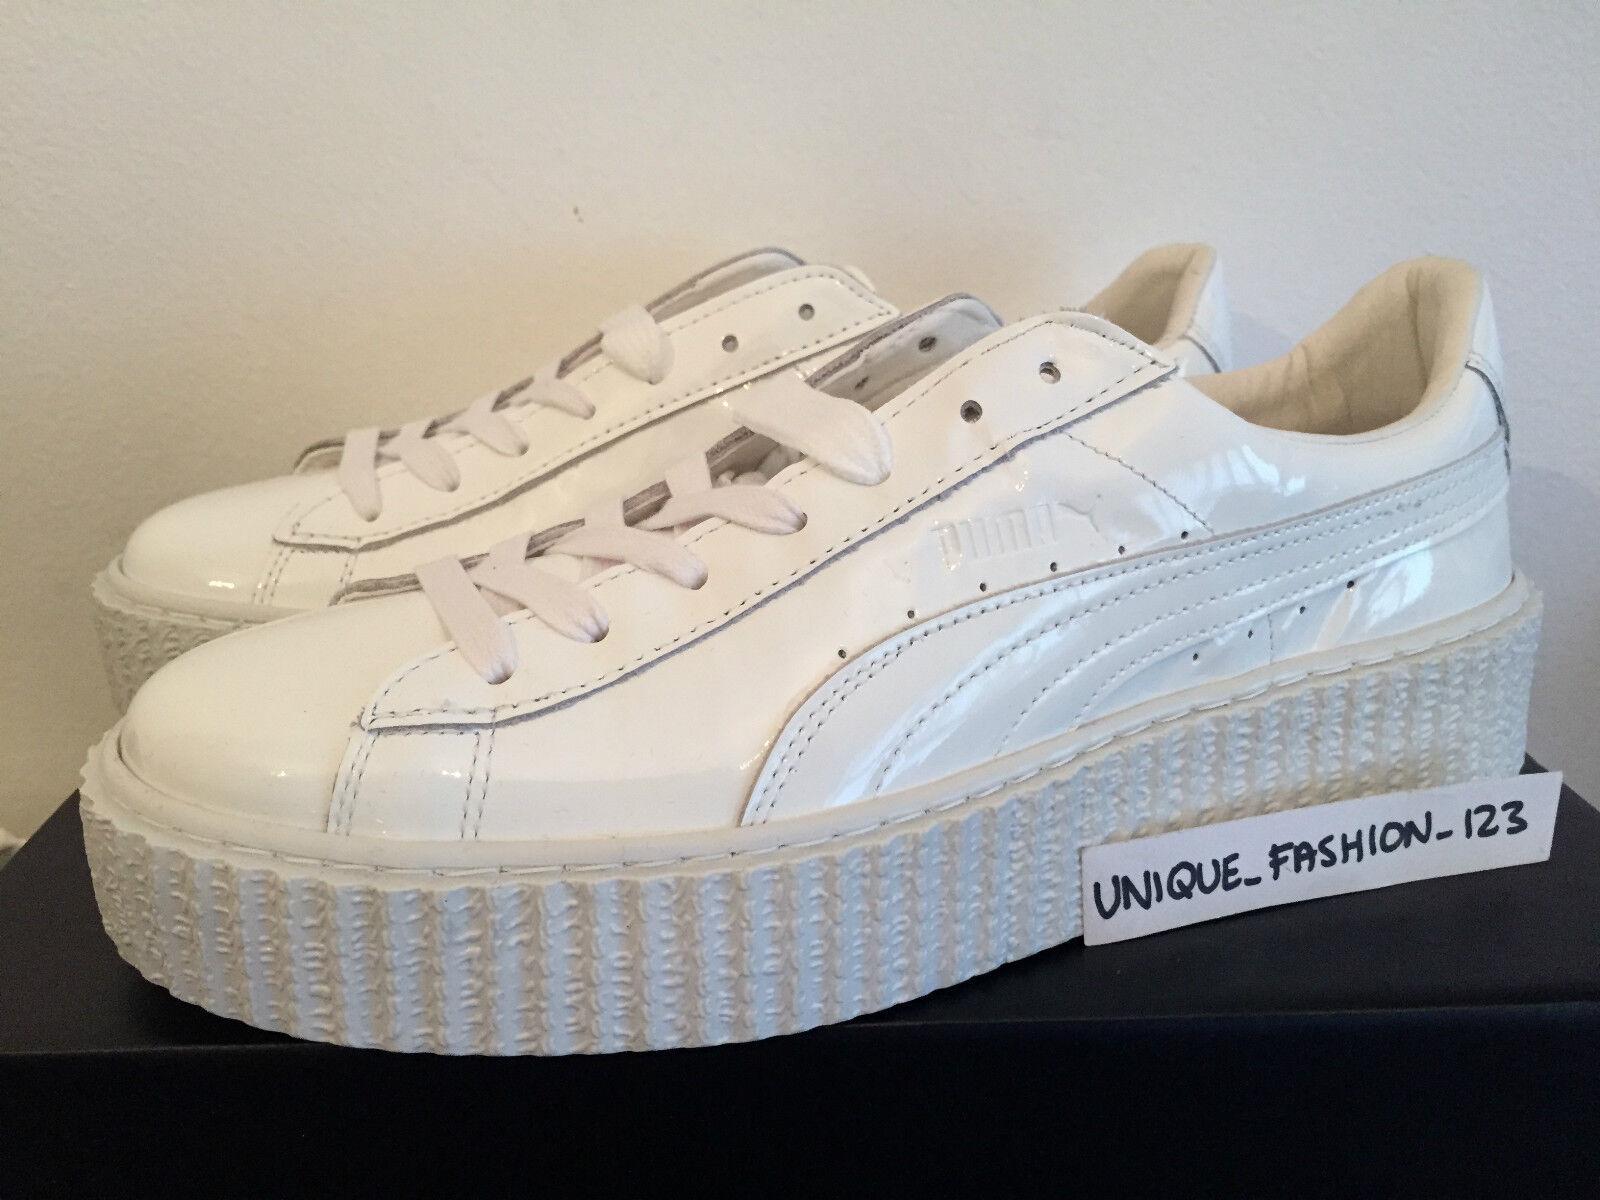 PUMA FENTY RIHANNA CREEPERS UK 4 5 6 7 8 TRIPLE WHITE GLO PATENT LEATHER BASKET